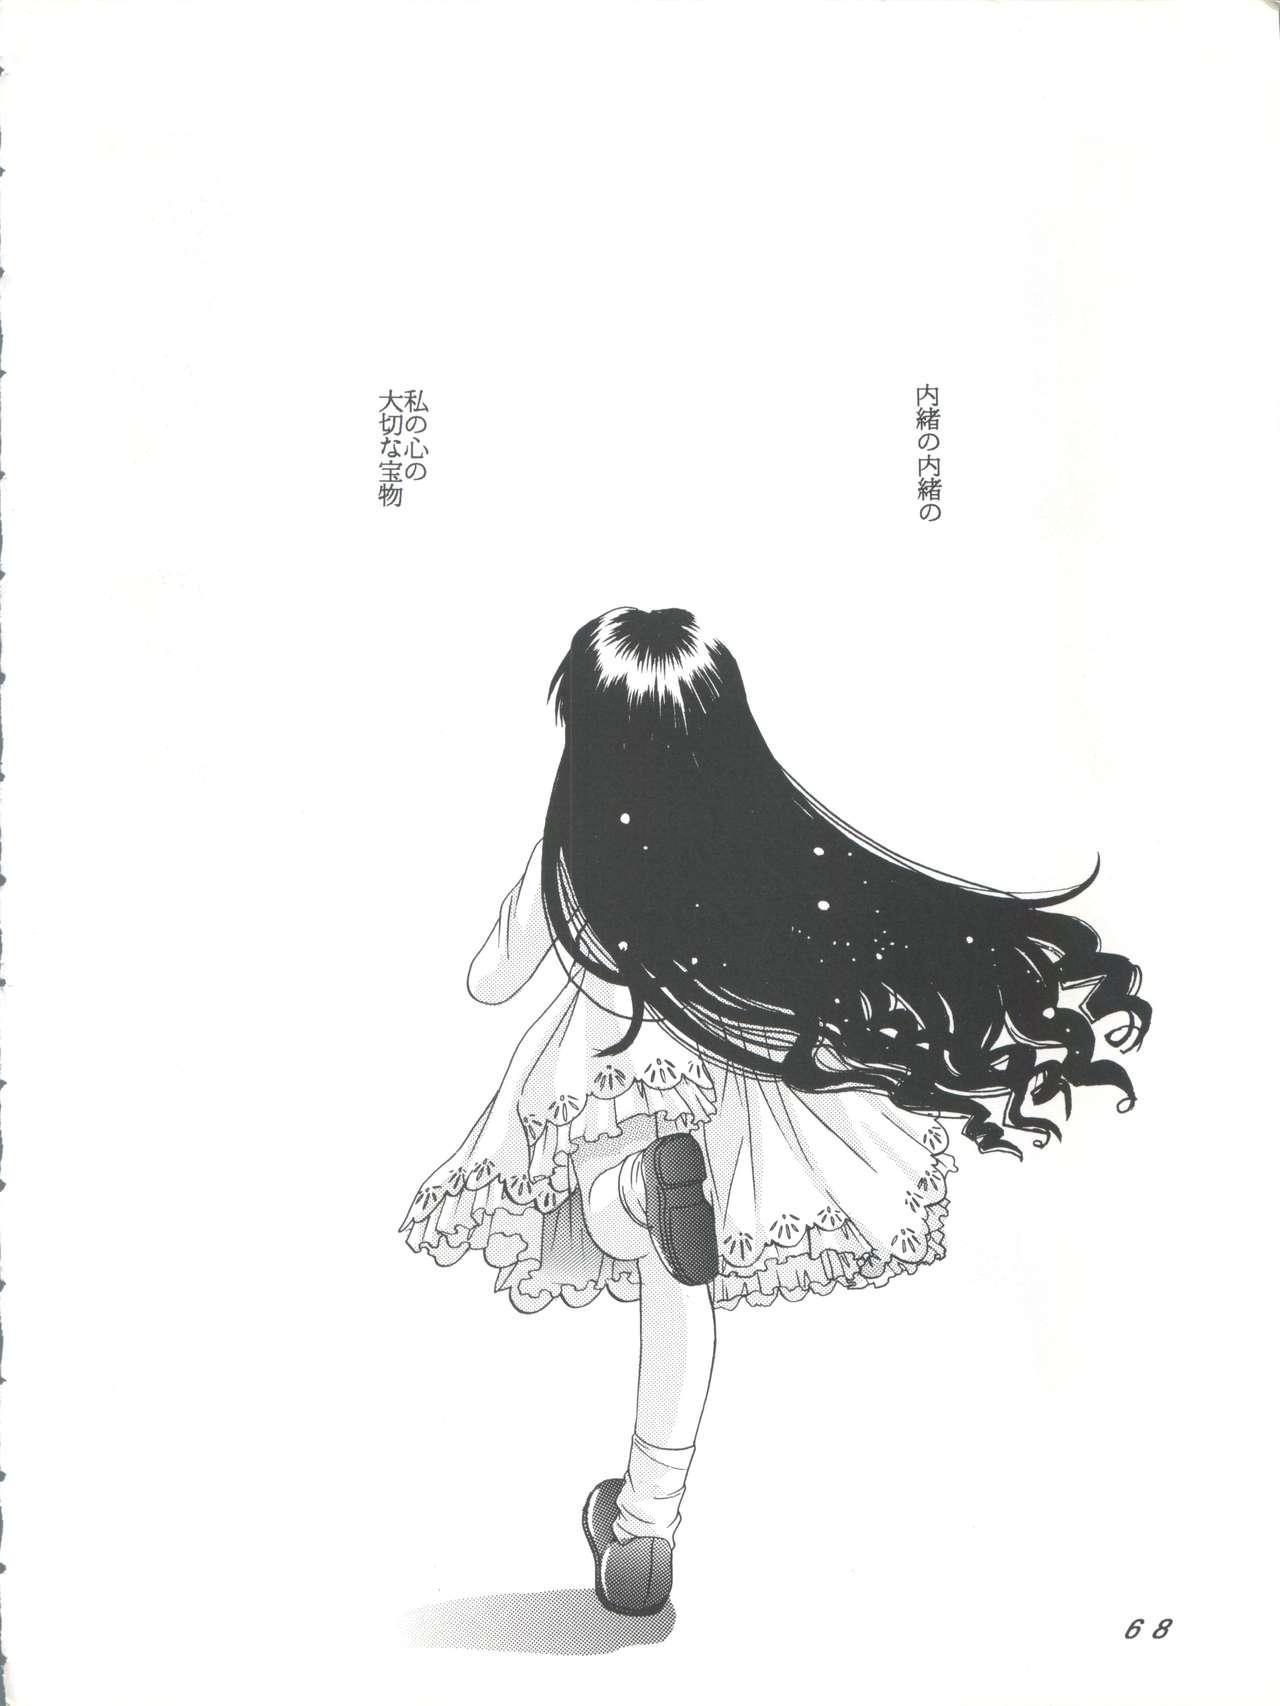 Card Captor Sakura Act 3 Green Version 66